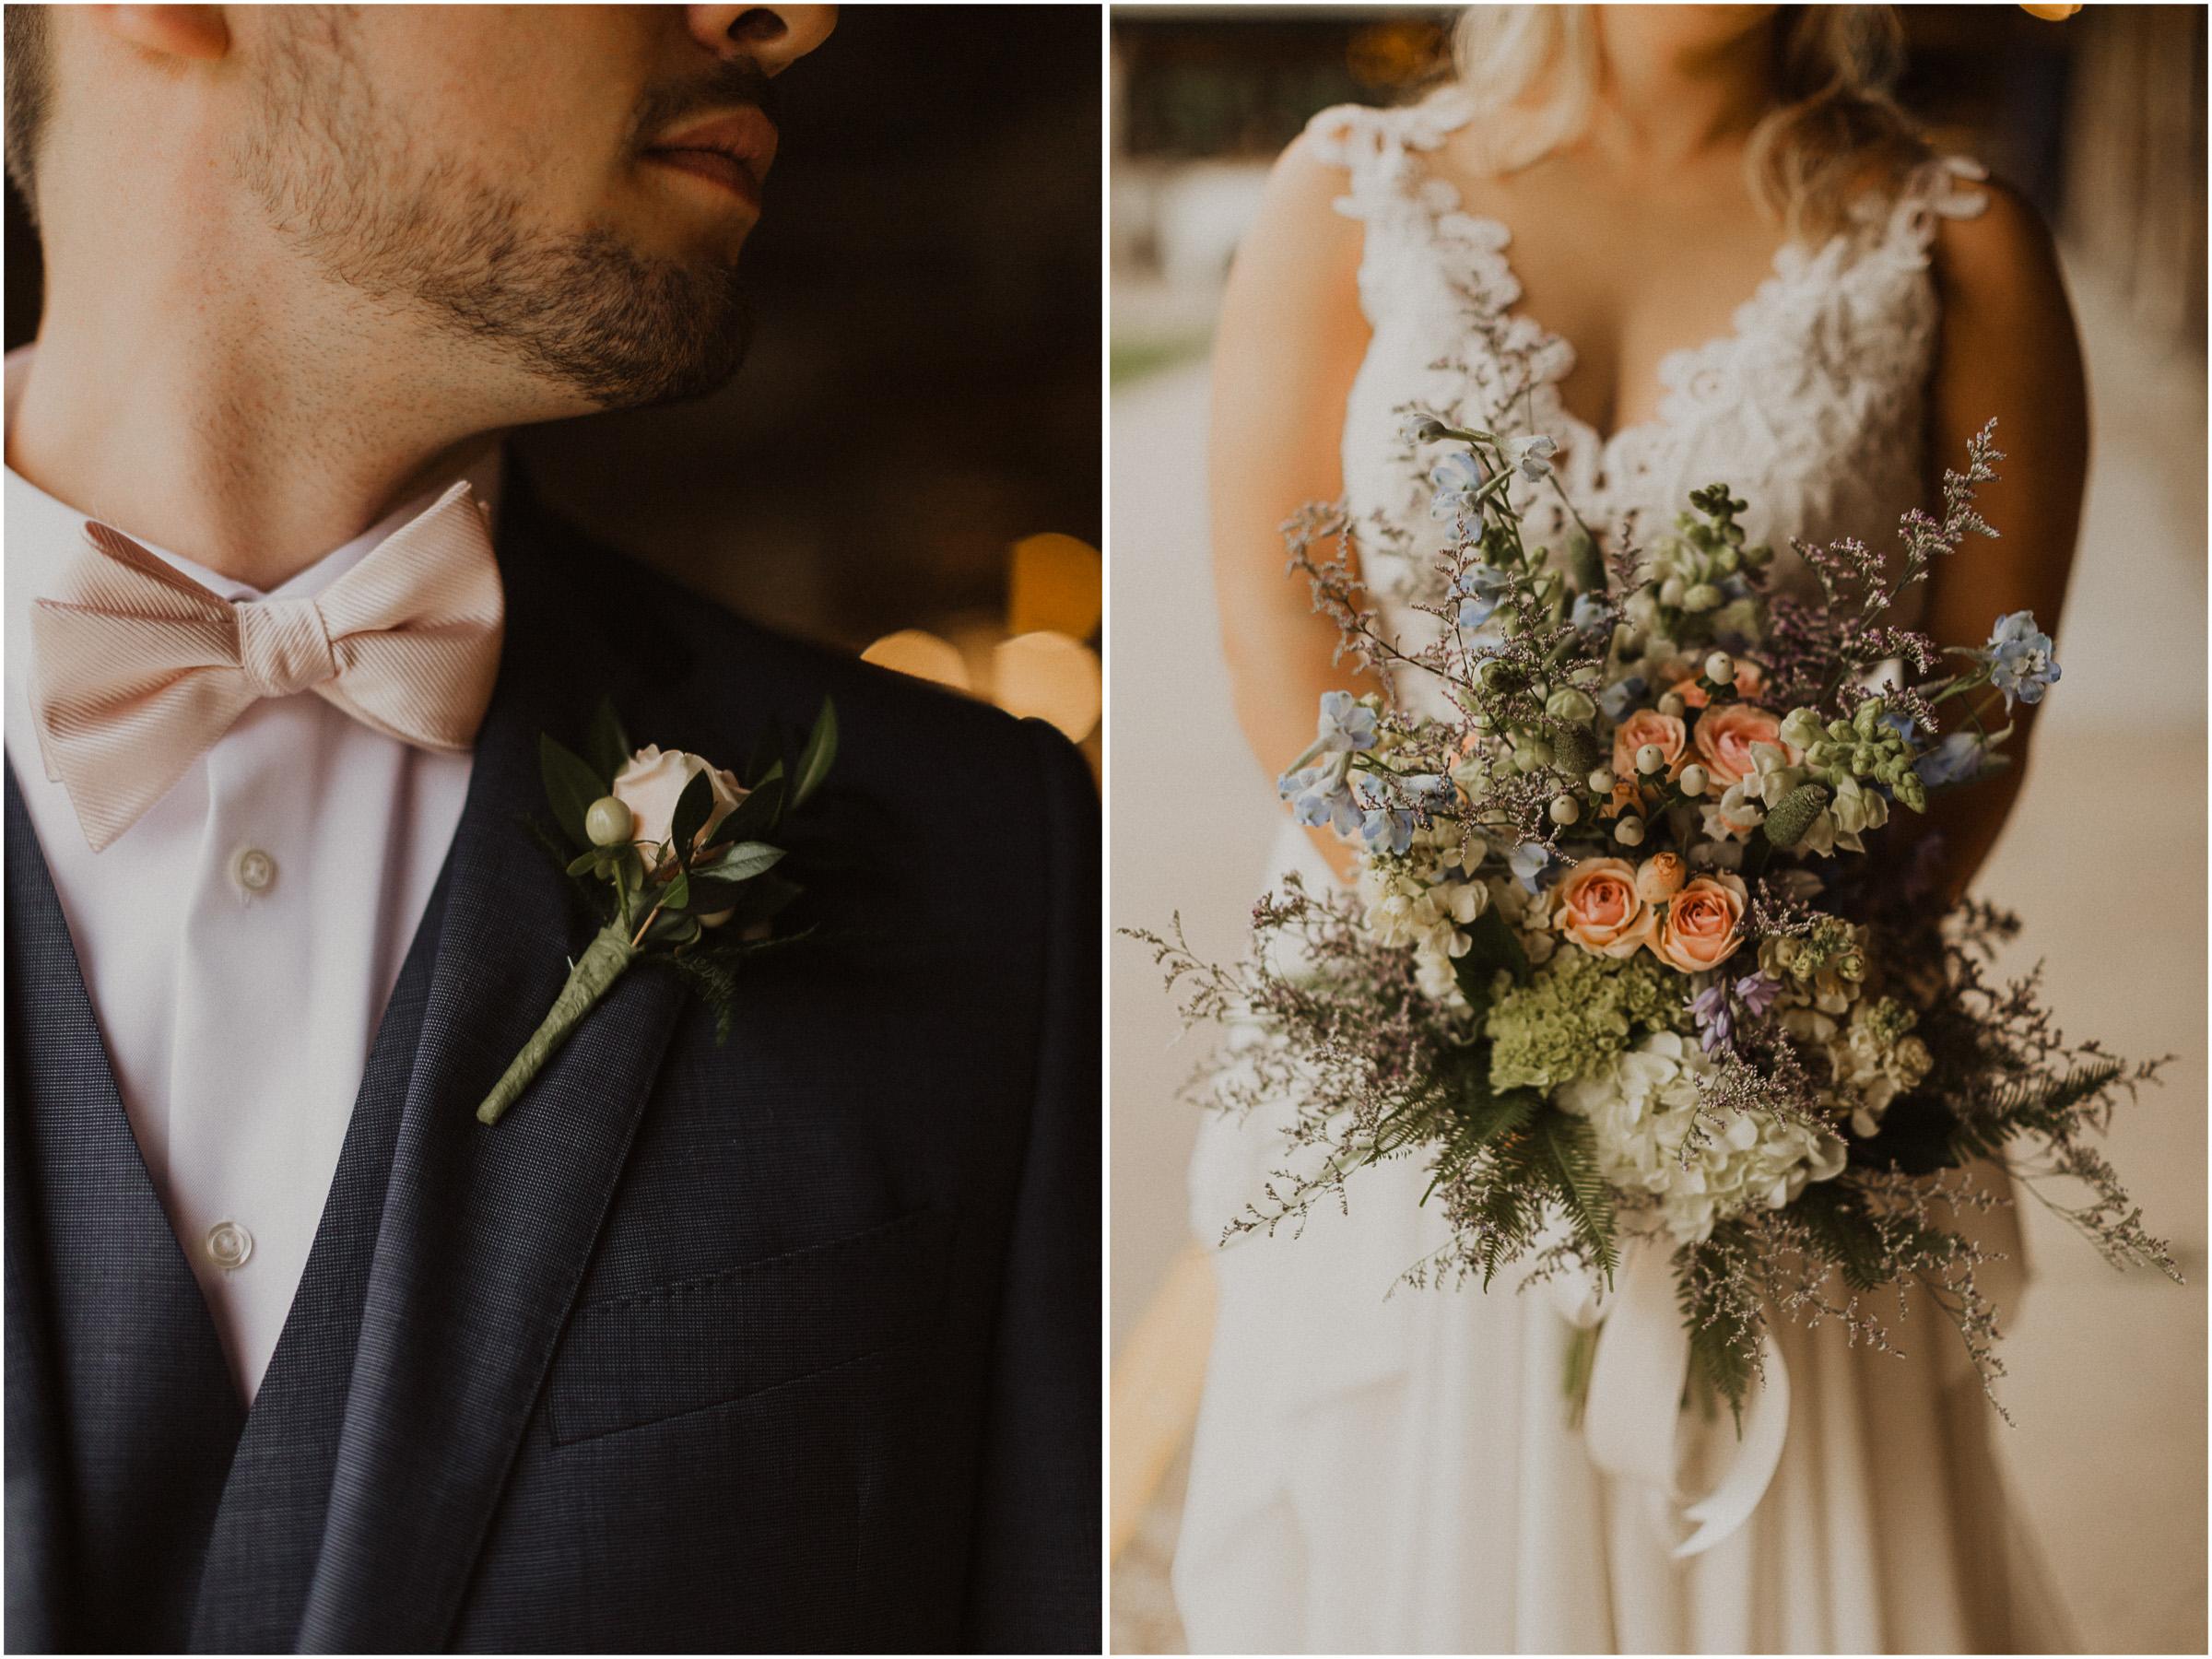 alyssa barletter photography nelson wedding nebraska city lied lodge morton barn spring wedding photographer-29.jpg